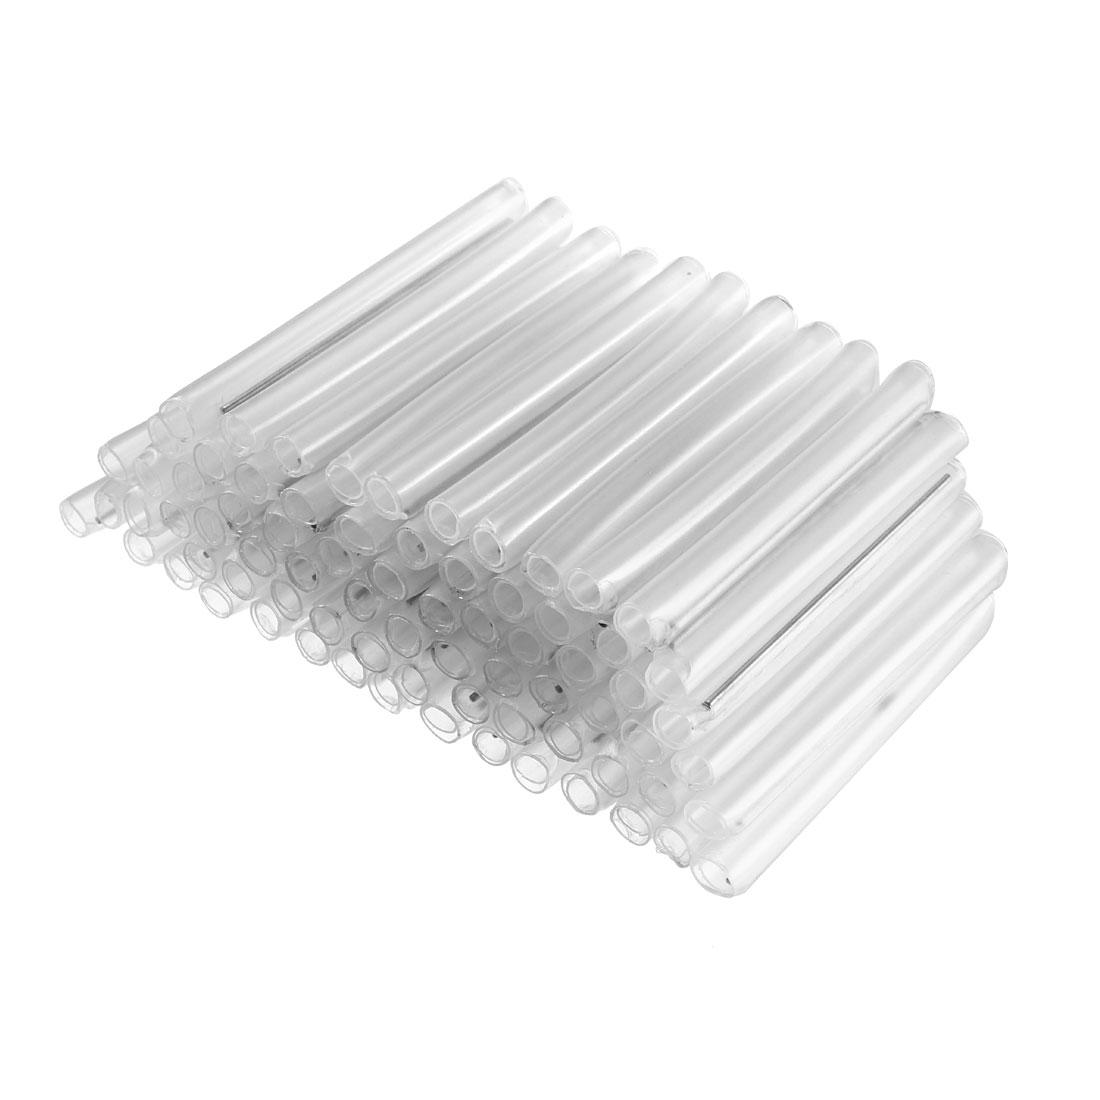 58mm 5.6mmOD Fiber Optic Splice Tube Protector, Heat Shrinkable Tubing 400pcs